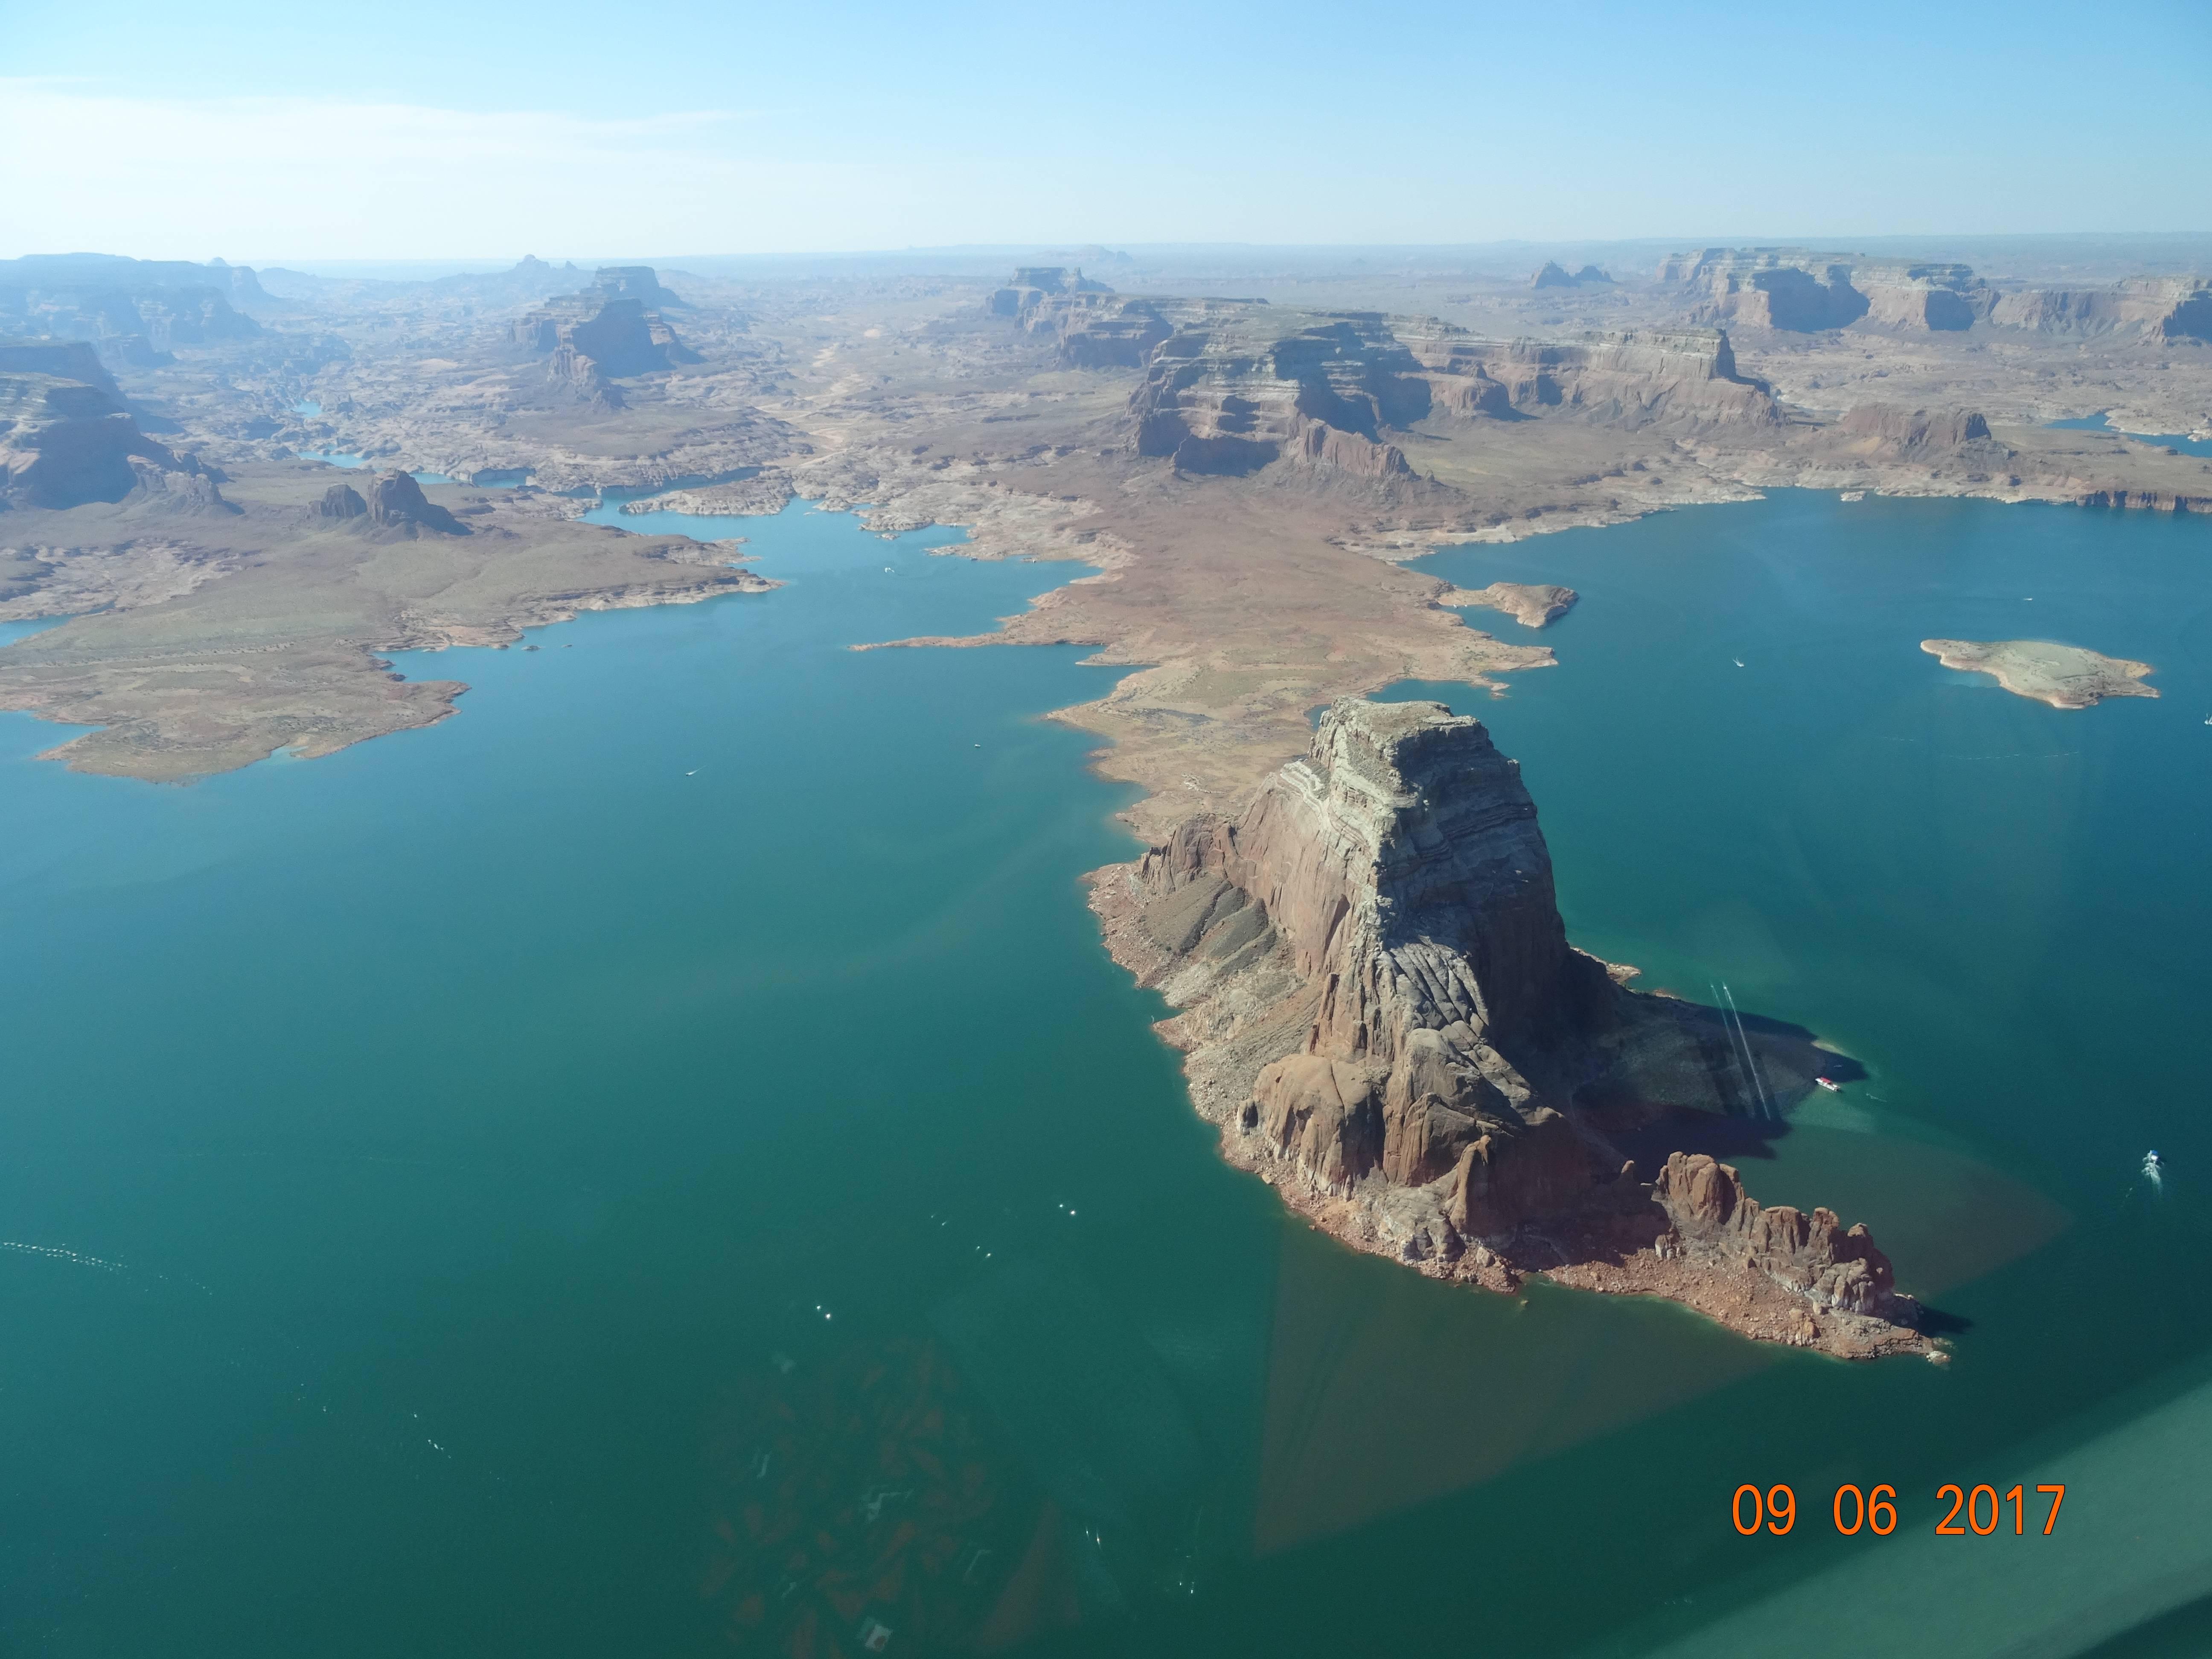 Photo 3: Lake Powell  - Arizona - USA